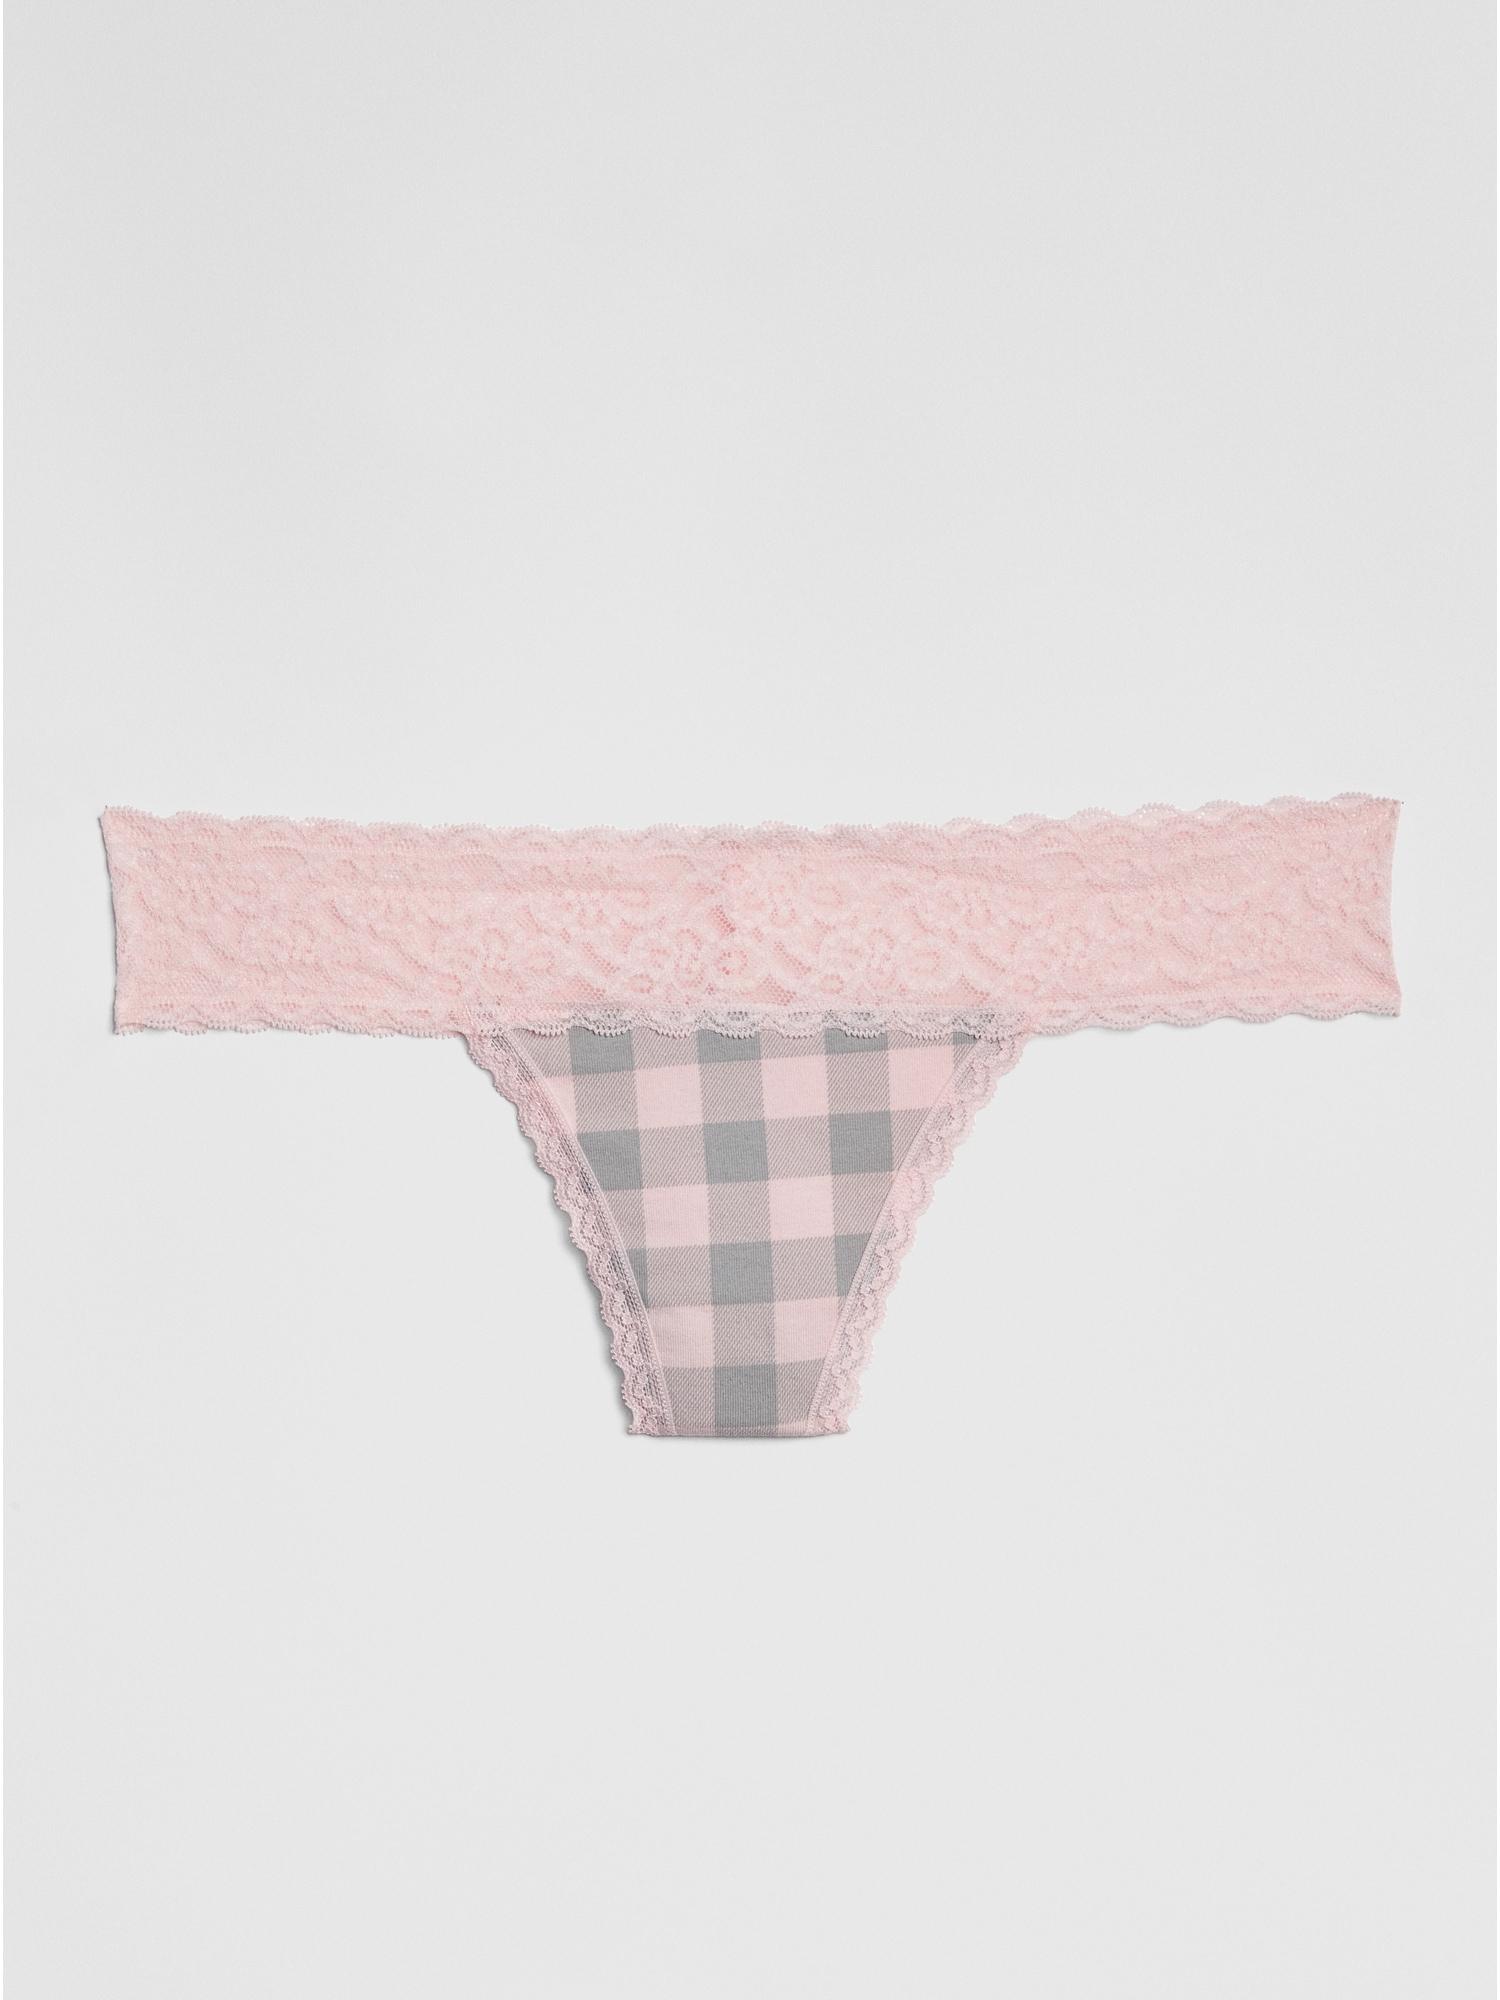 27cda91c69c02 Stretch Cotton   Lace Thong